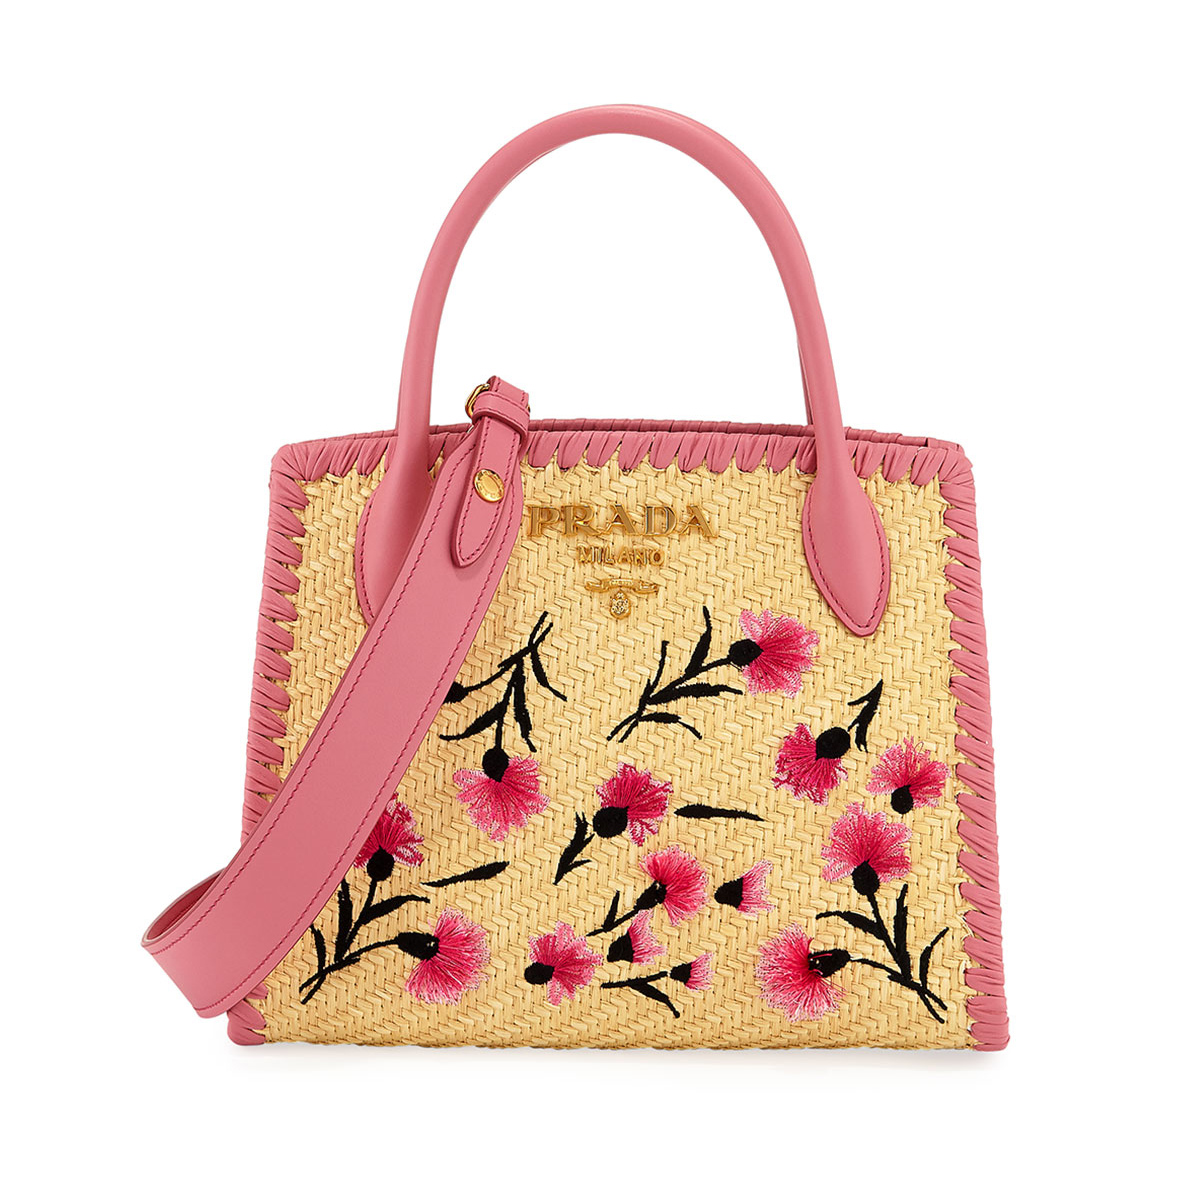 prada pink straw bag.jpg